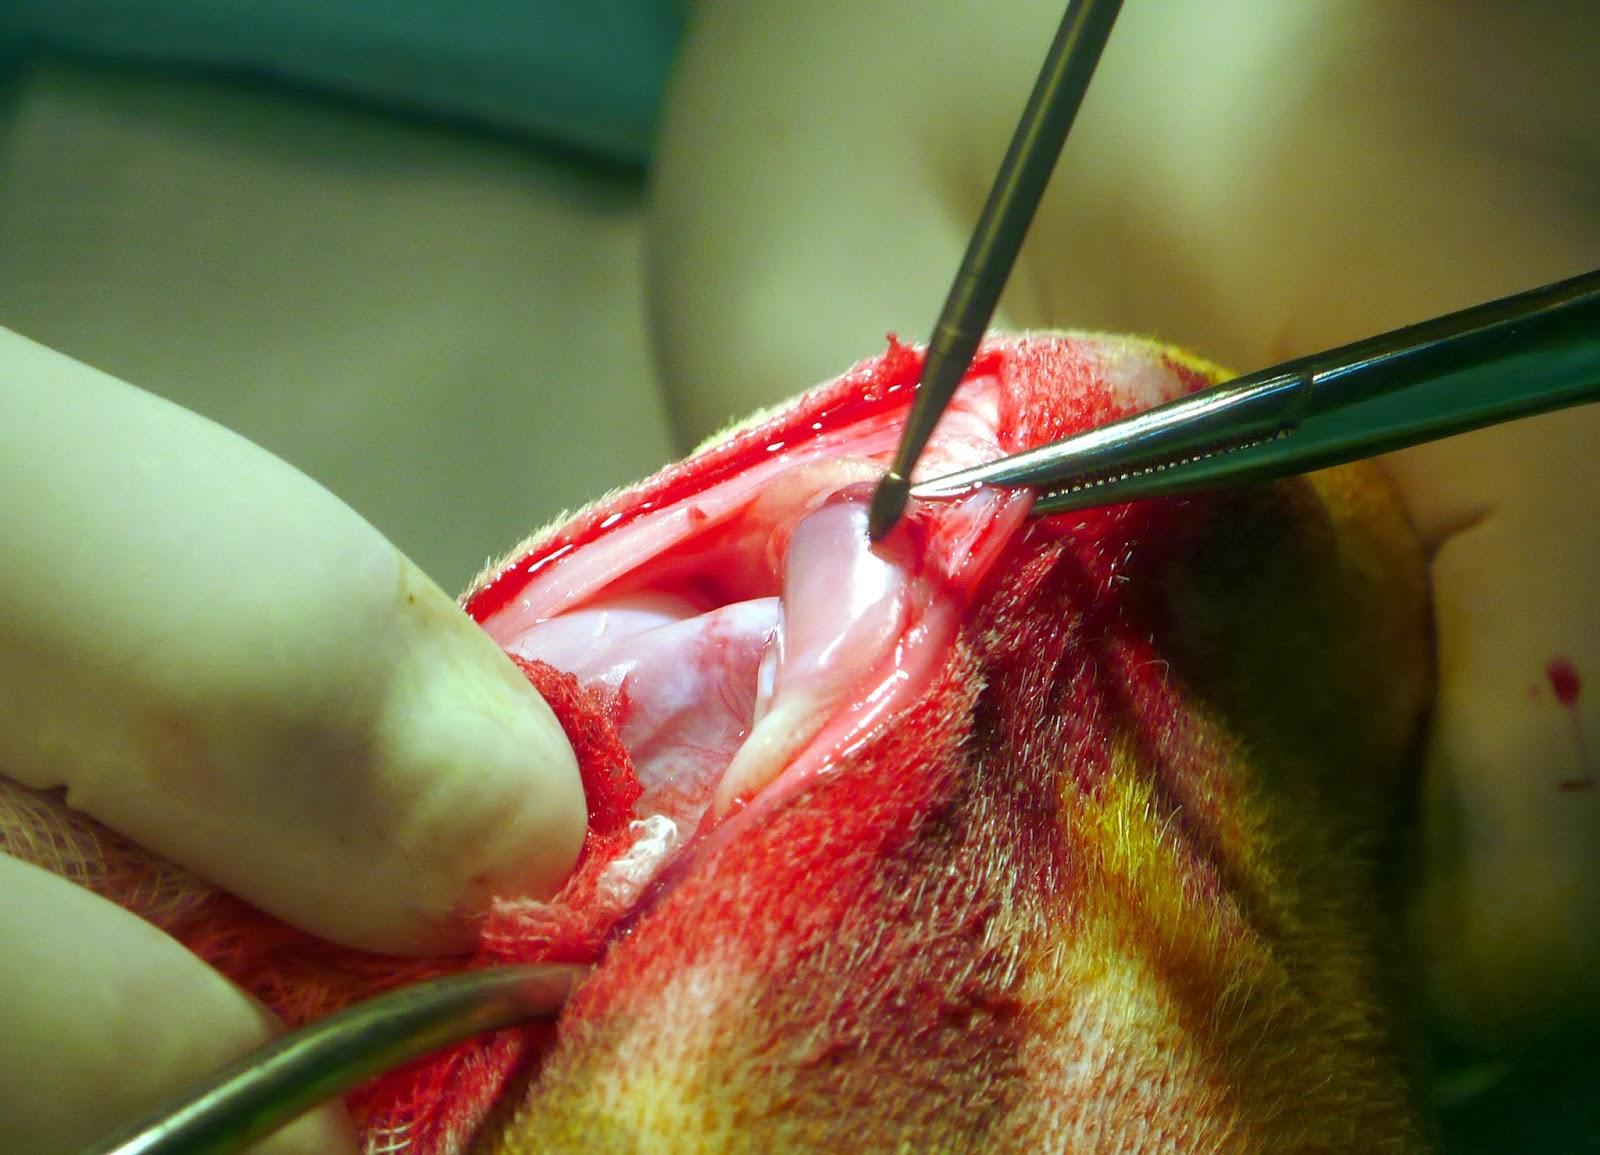 tratamiento patelopatia